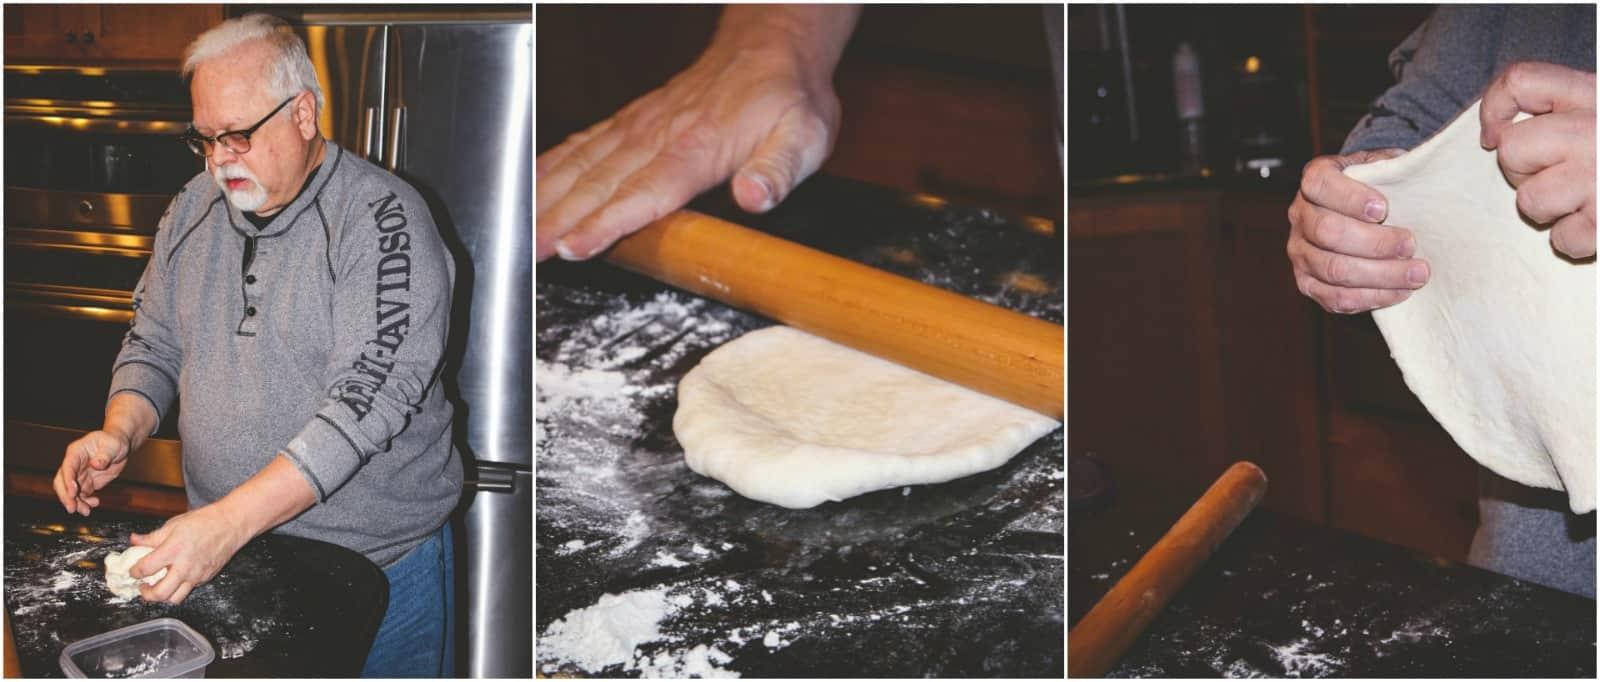 Making the best homemade neapolitan pizza dough